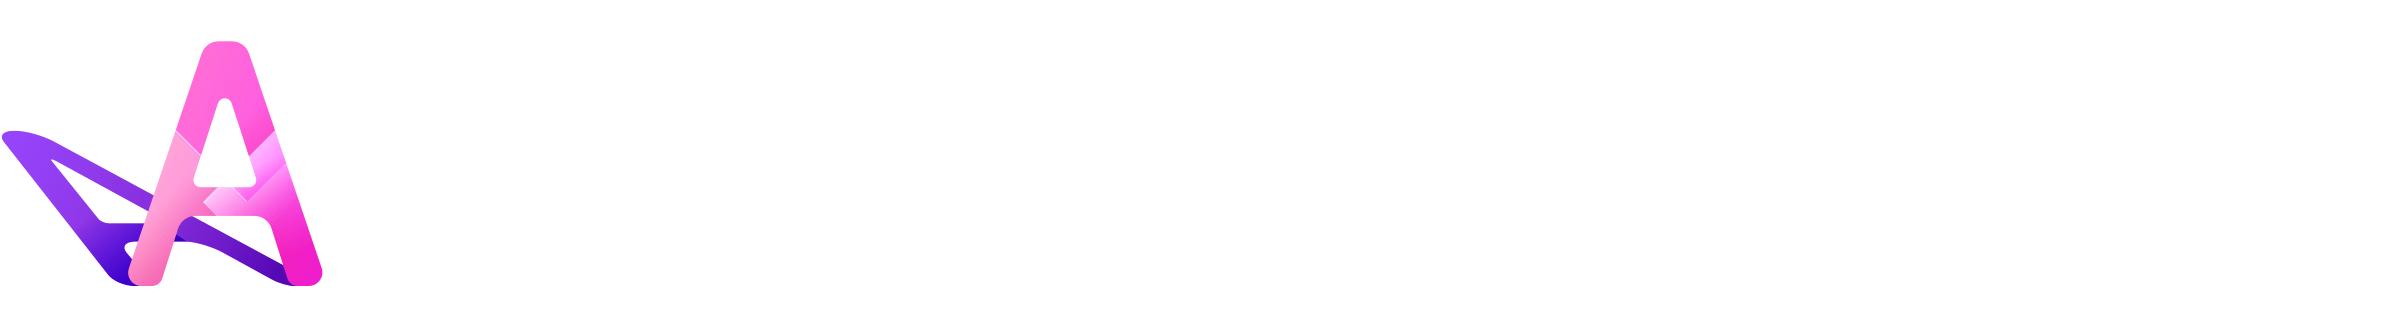 GitHub - MengTo/Angle-Sketch-Plugin: A free Sketch plugin